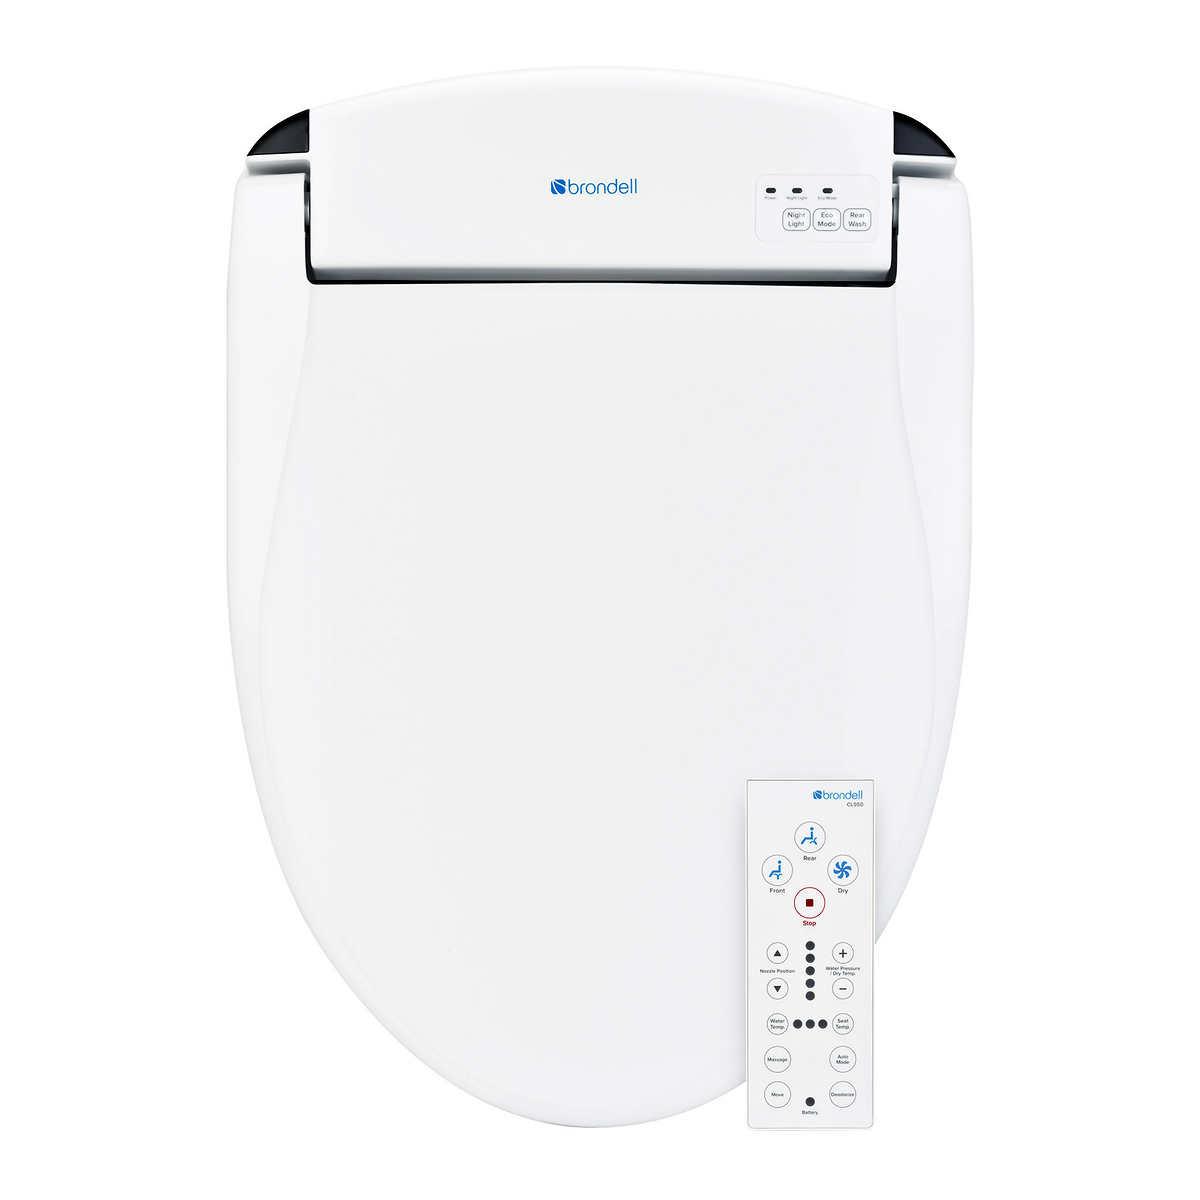 Brondell Swash Cl950 Bidet Toilet Seat